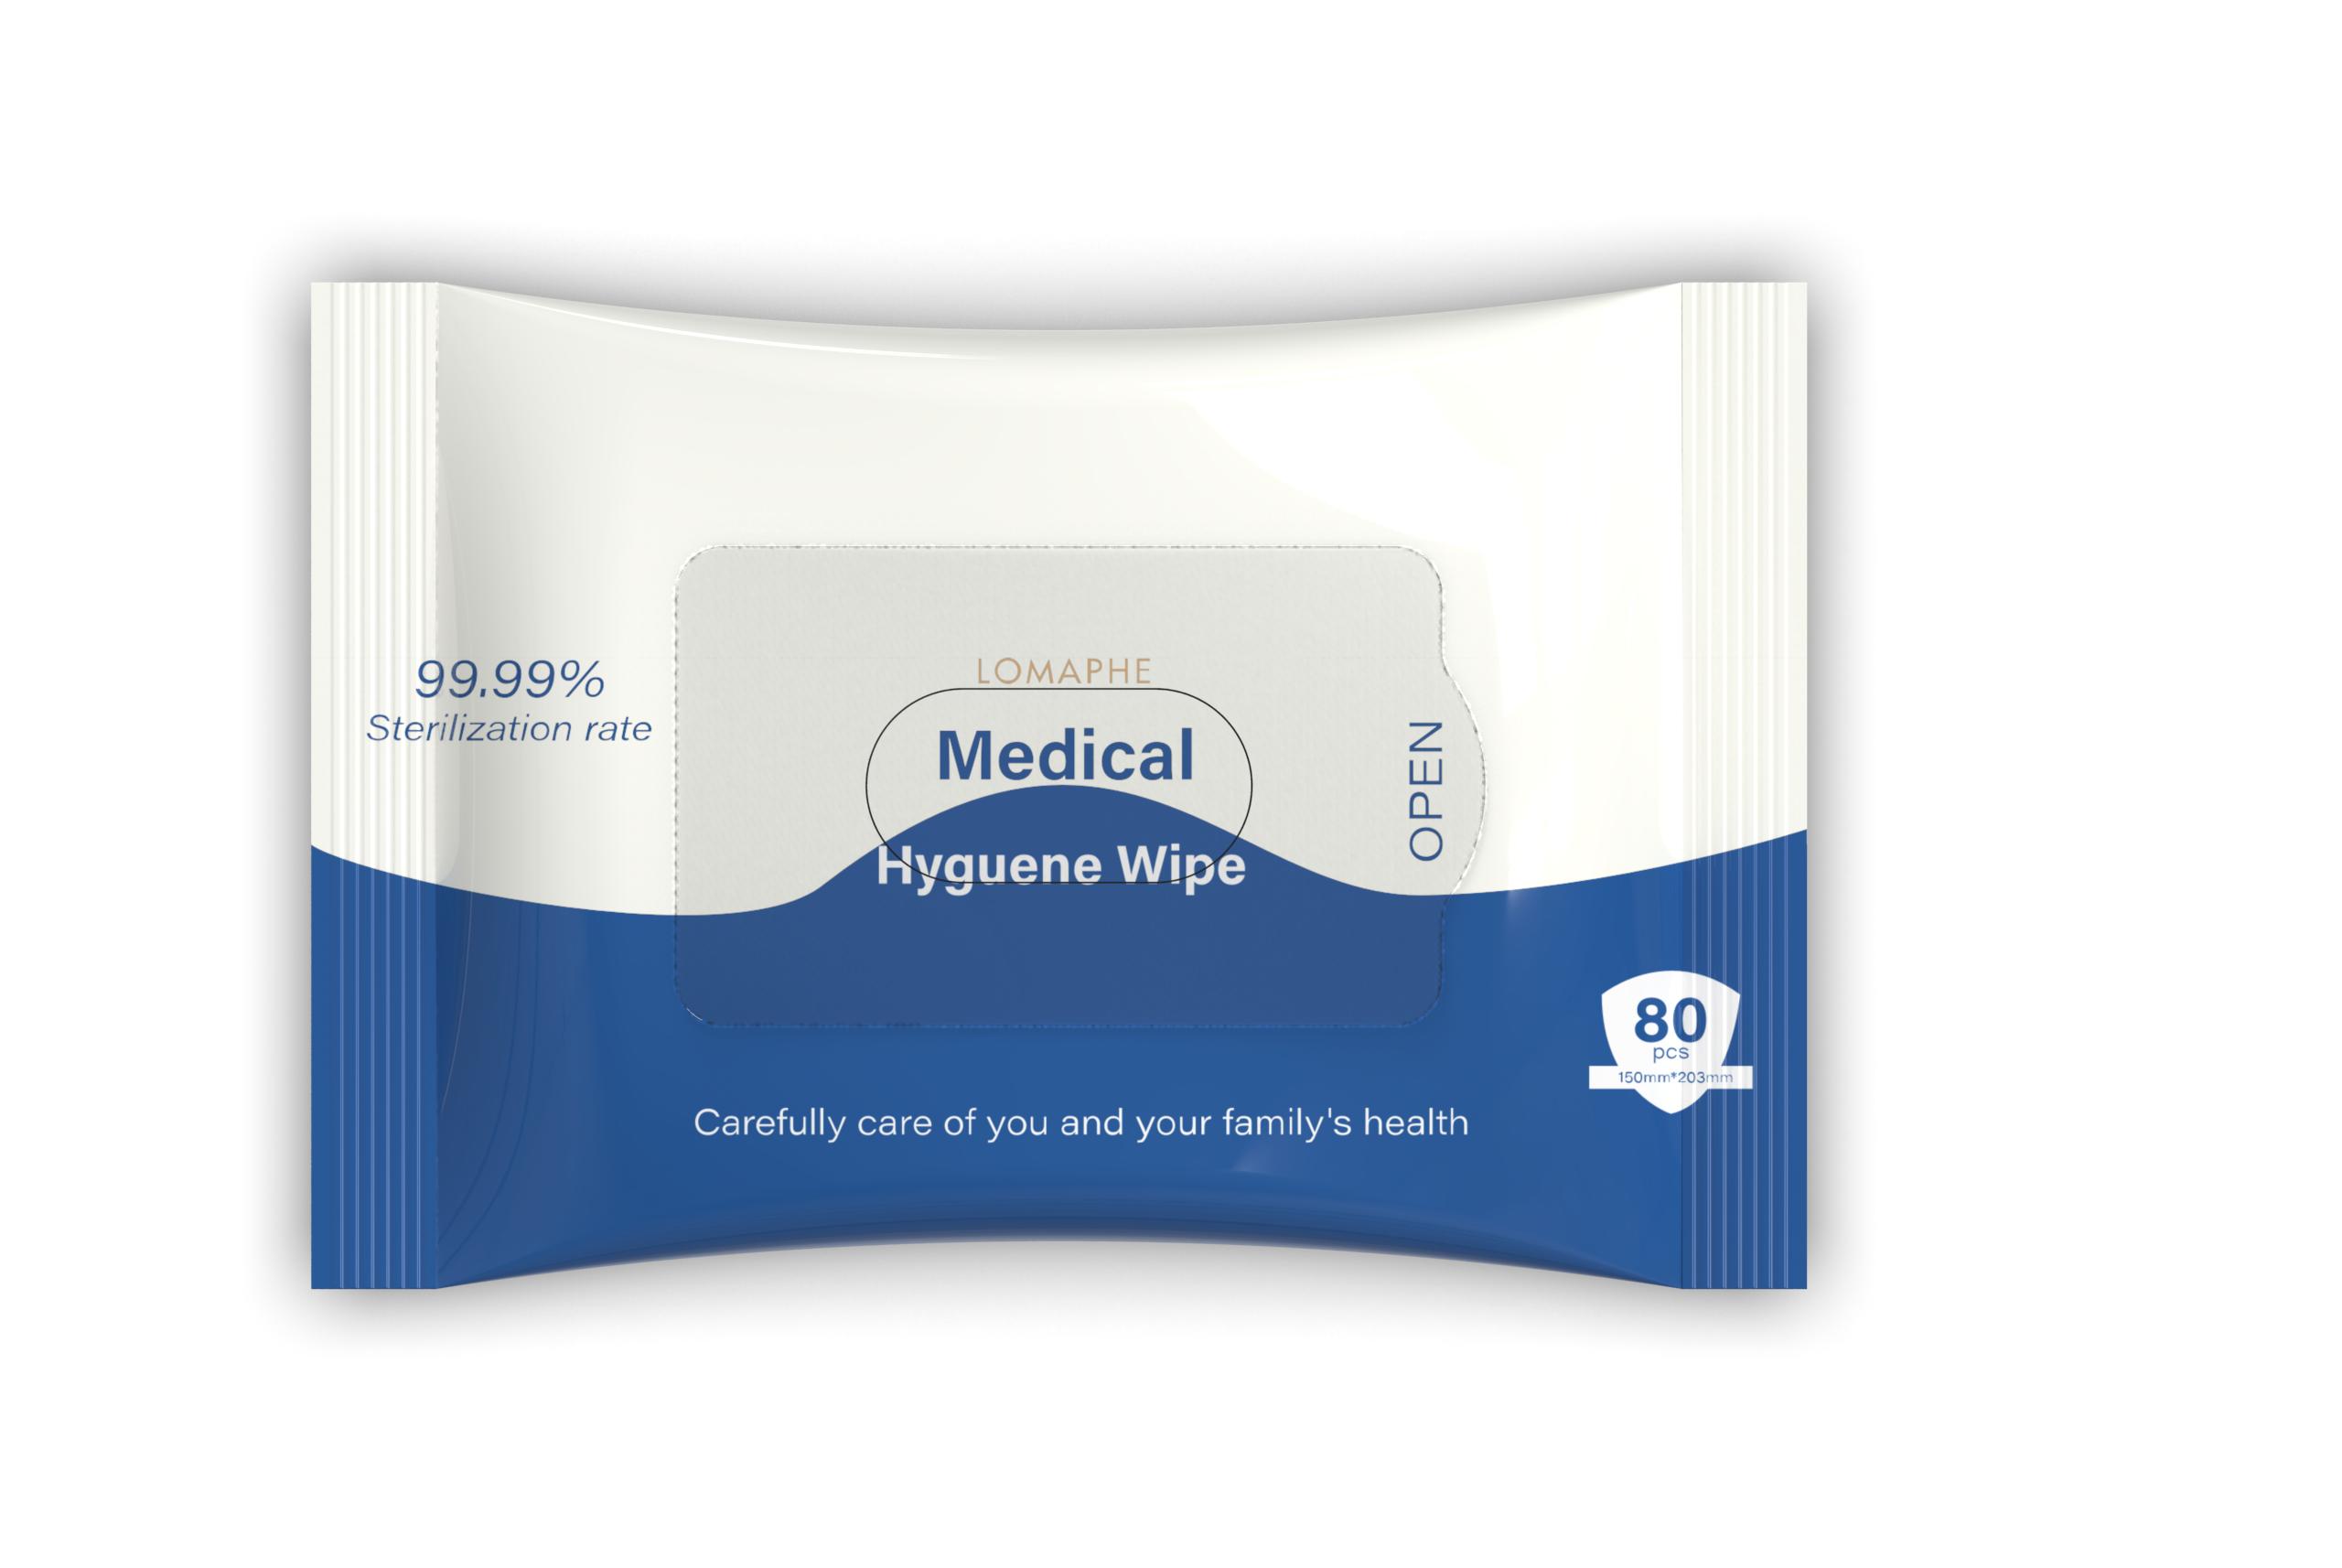 15X20CM medical wipes